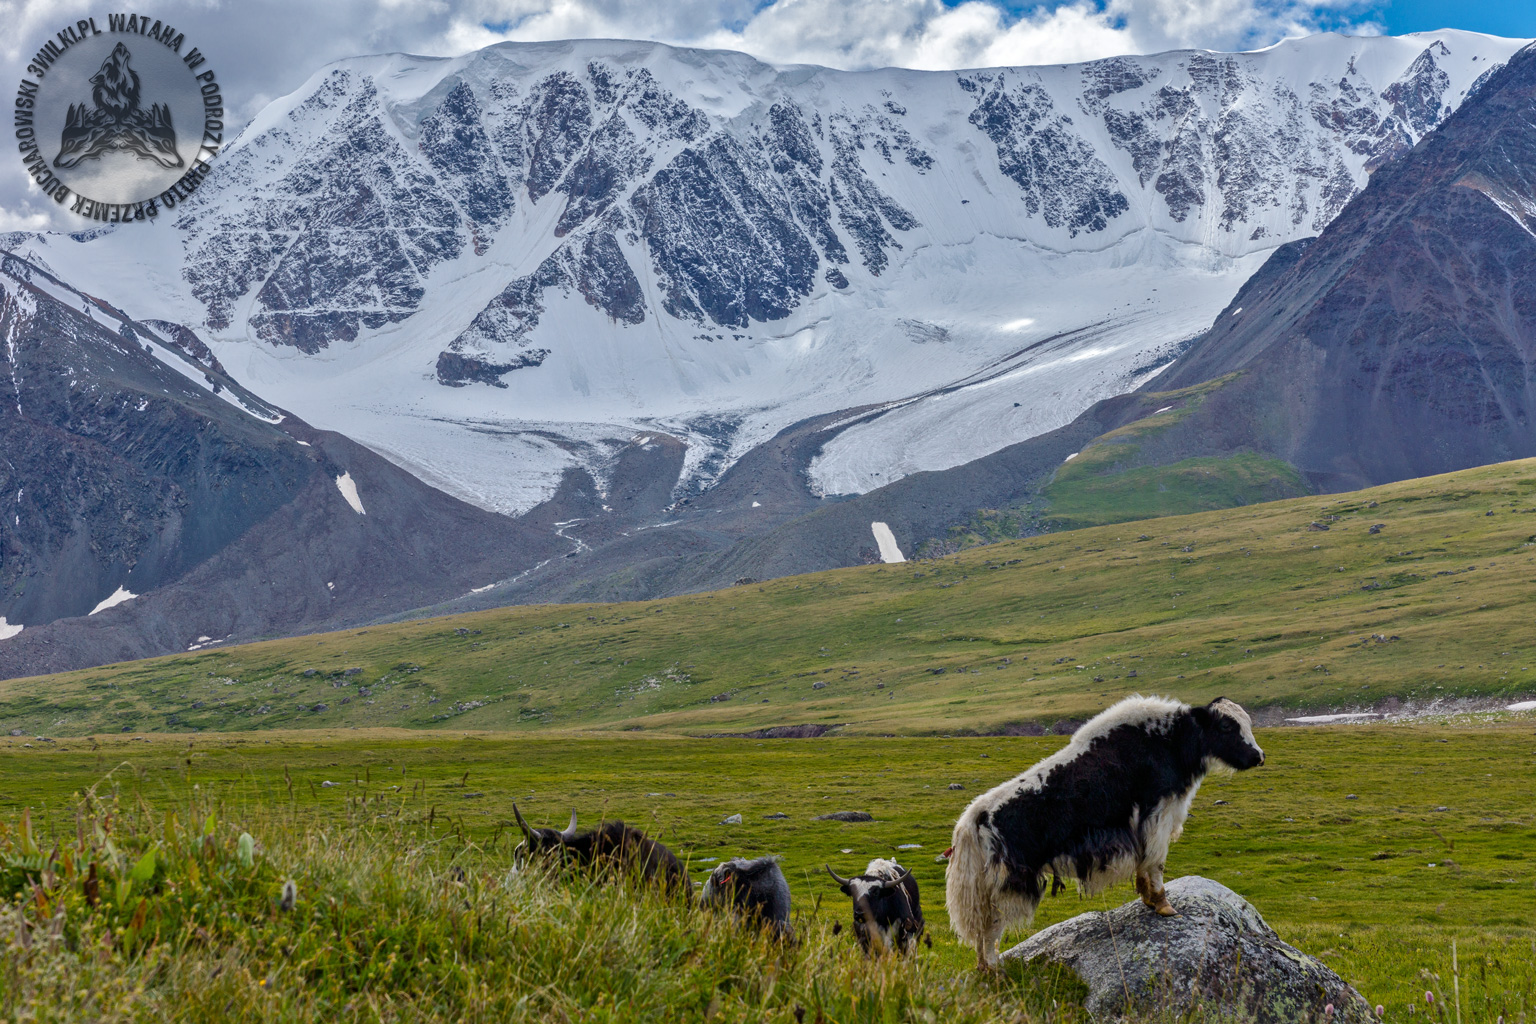 mongolia_tavanbogd_trekking_jak